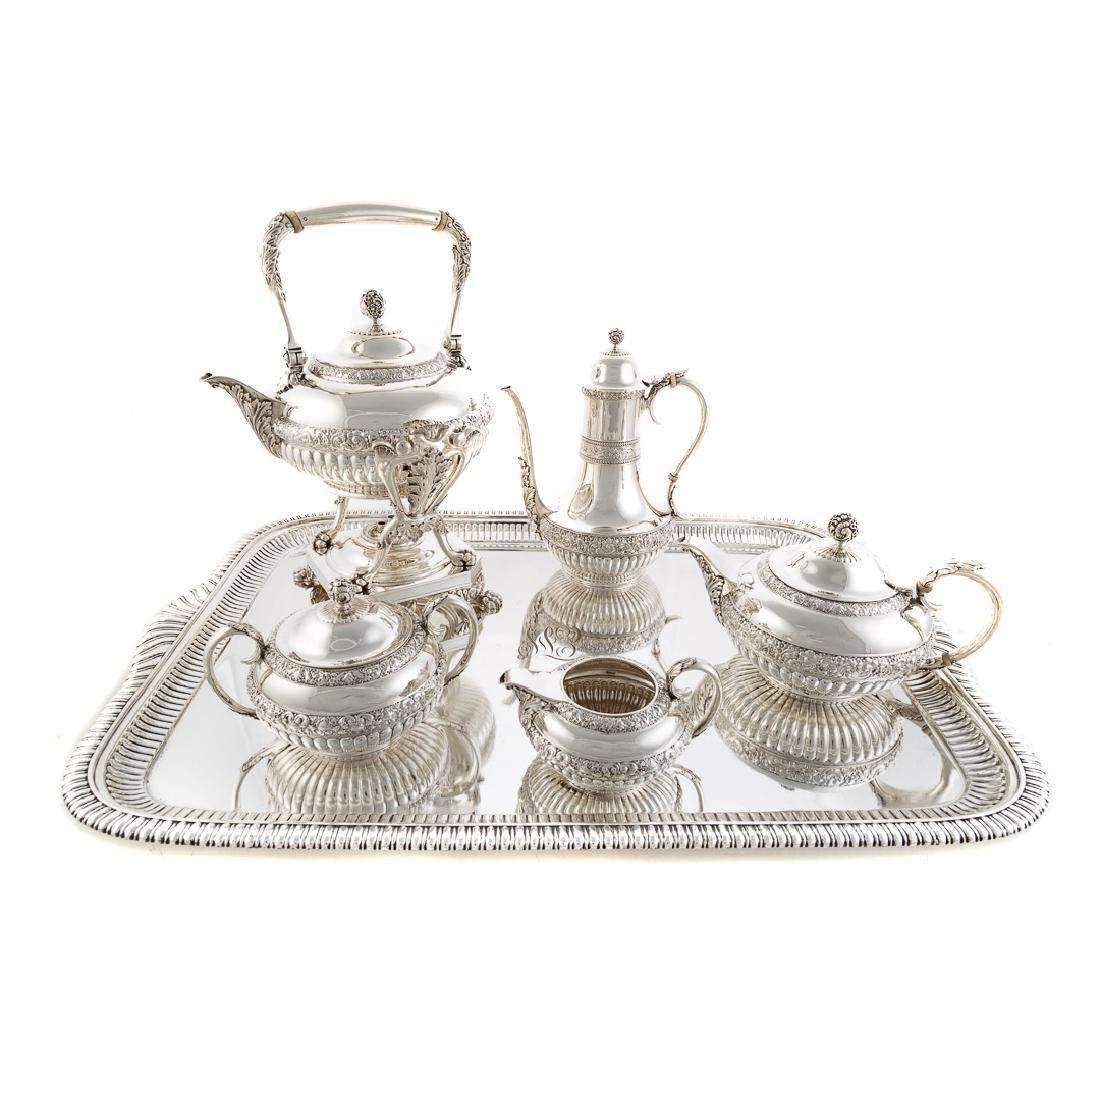 Very fine Tiffany sterling coffee & tea service